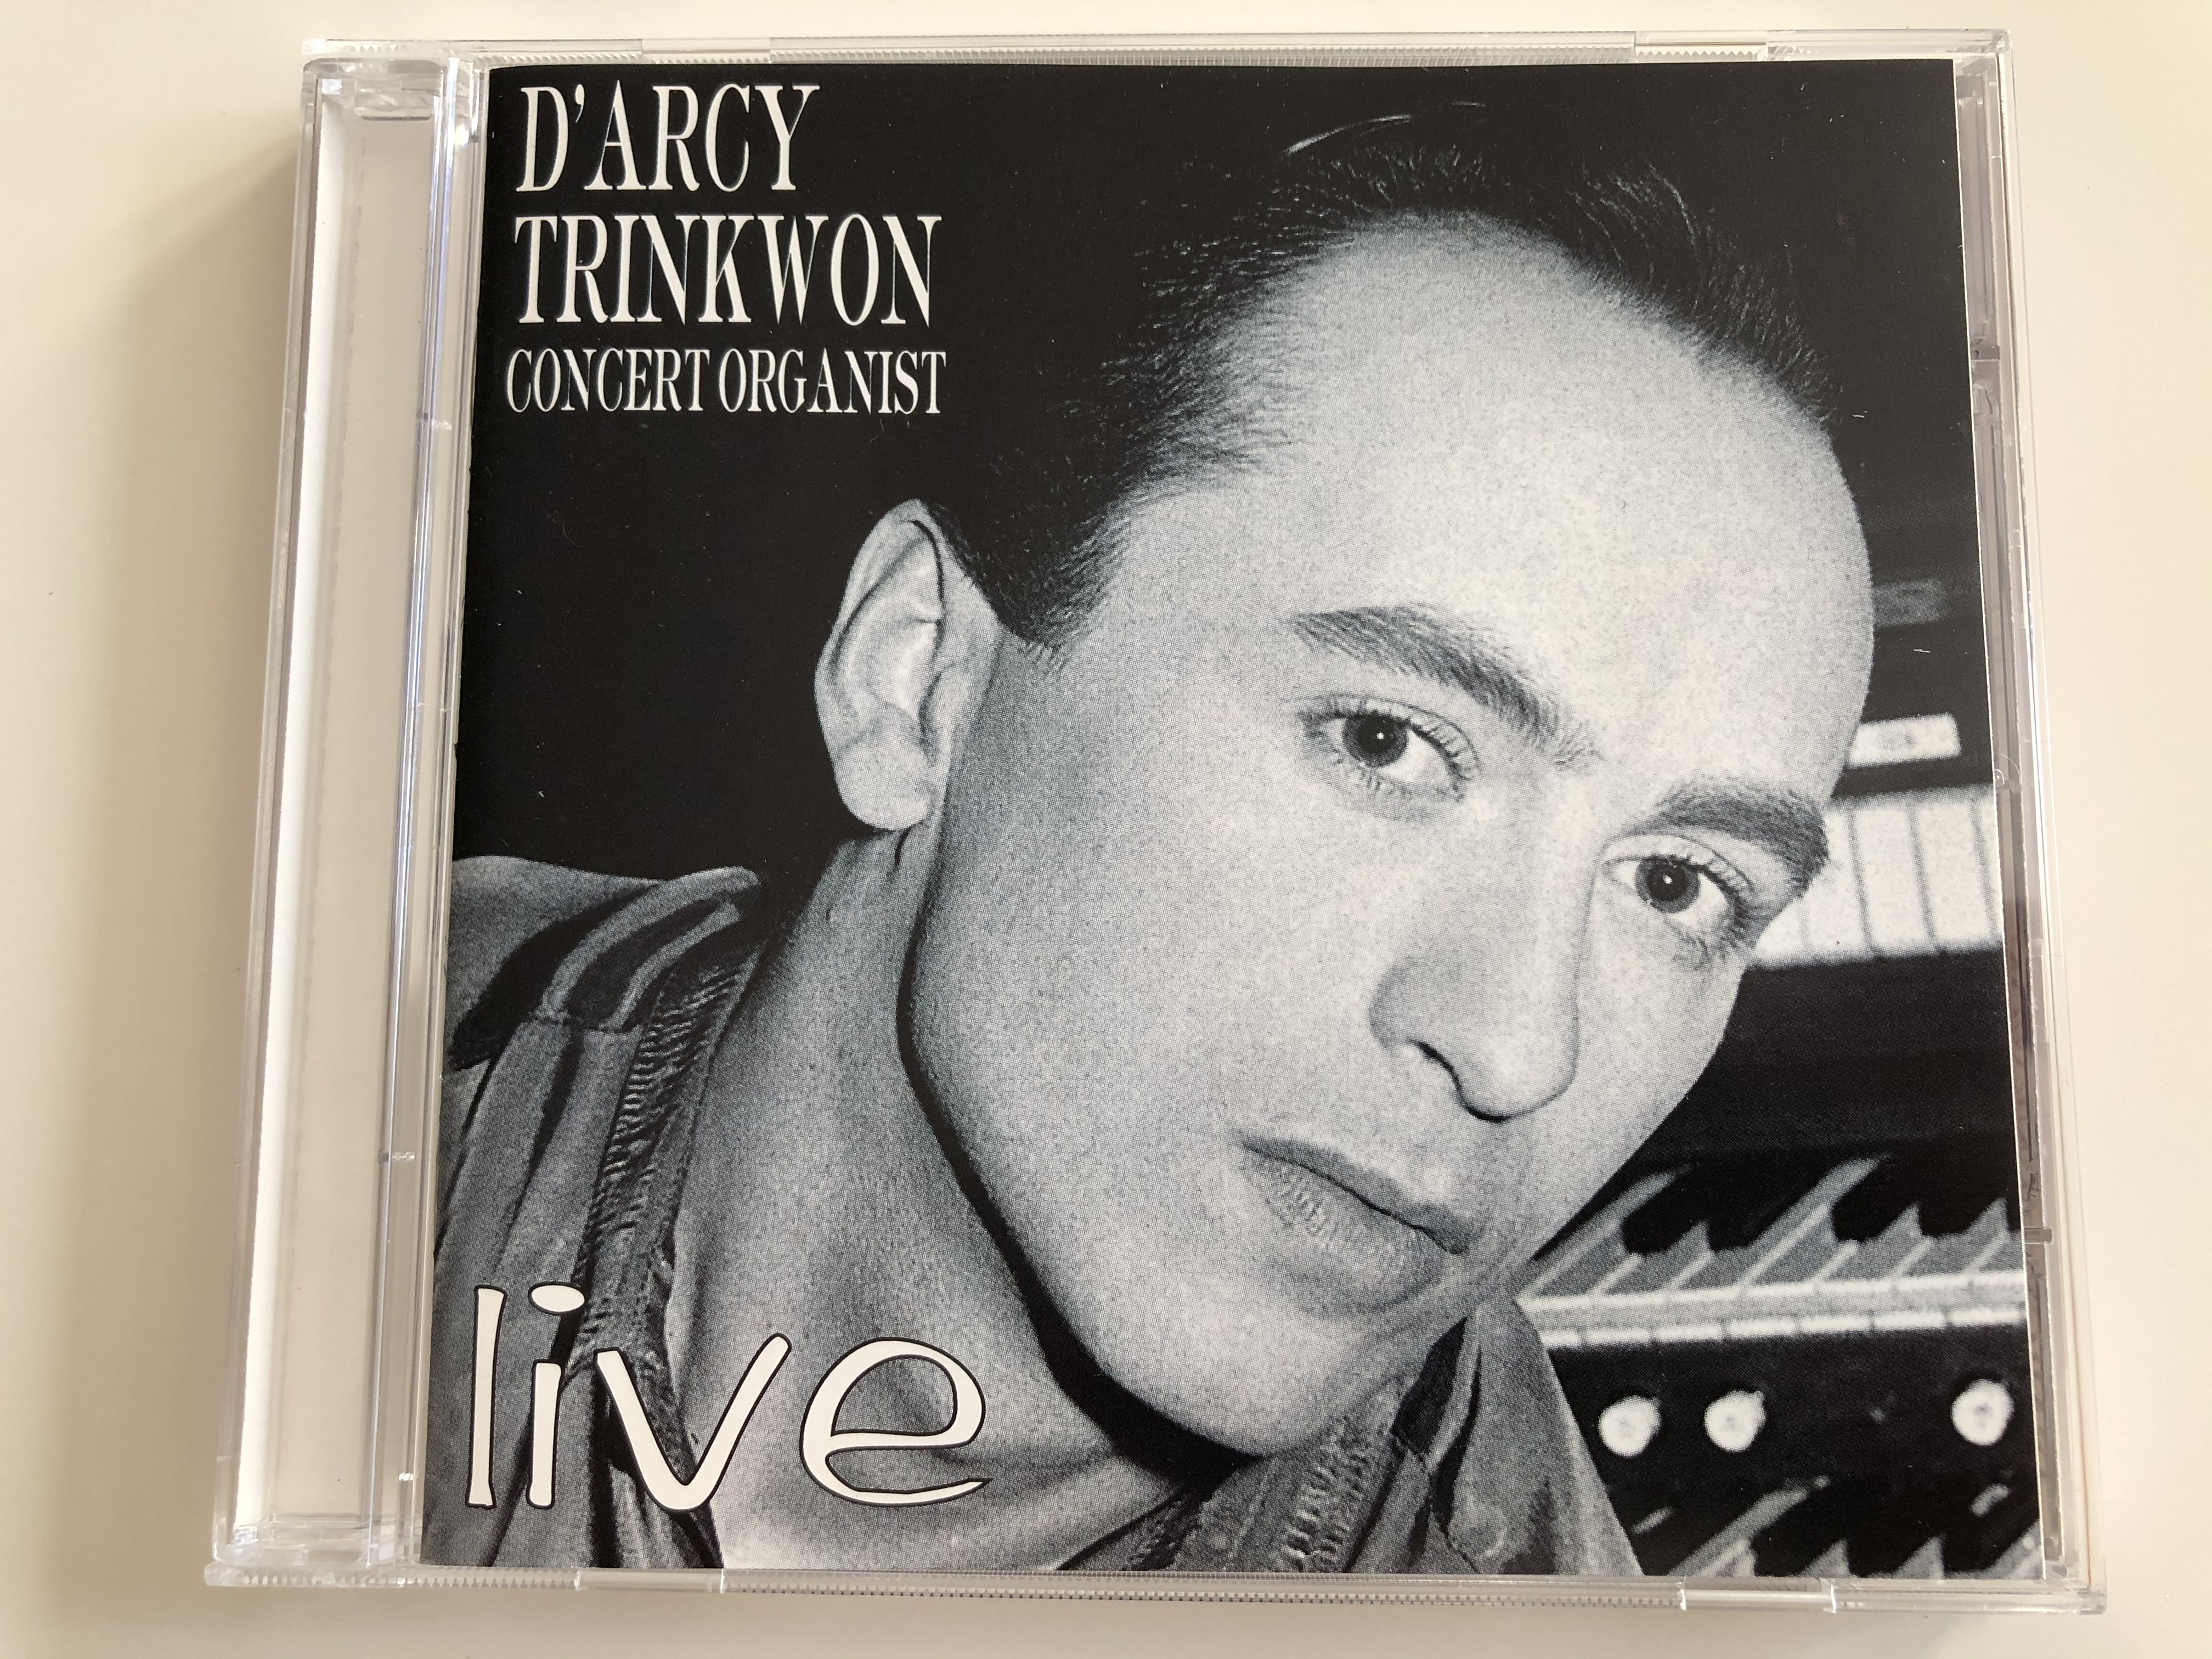 d-arcy-trinkwon-concert-organist-live-phoenix-discs-audio-cd-stereo-pd-0001-1-.jpg